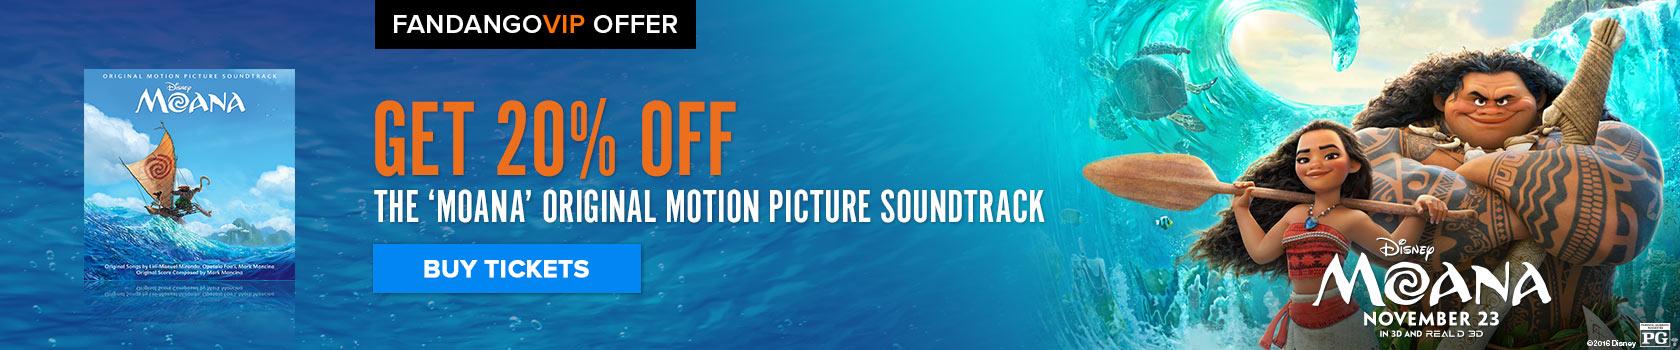 Fandango Moana Soundtrack Offer